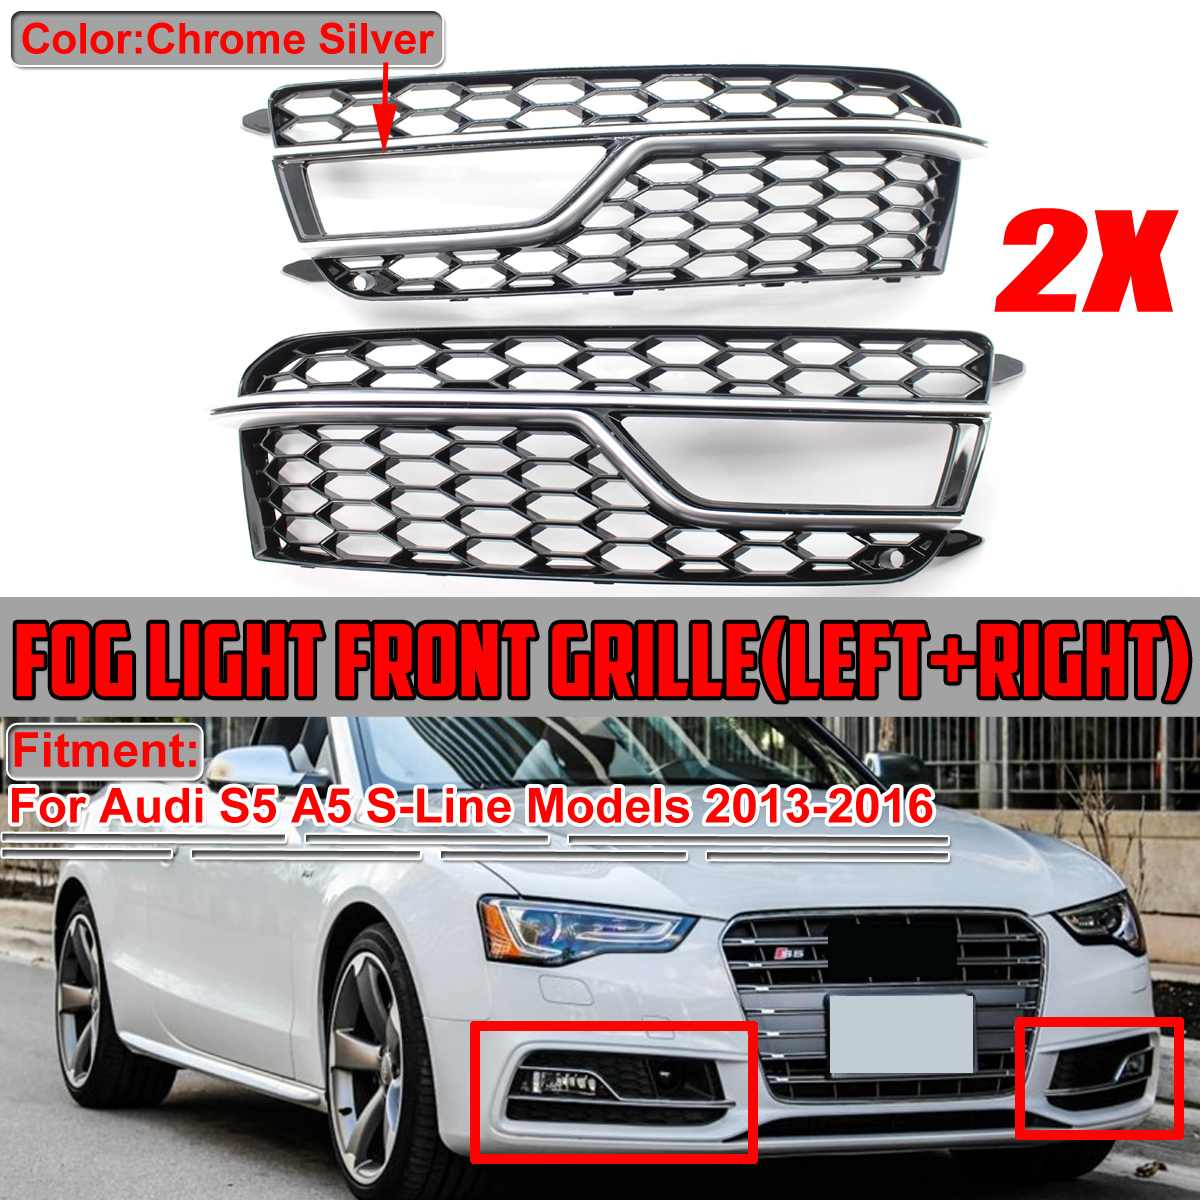 2 uds, parachoques de malla de nido de abeja para coche, cubierta de luz antiniebla para parrilla de panal, cubierta para Audi S5 A5 s-lines, parachoques 2013-2016 8T0807681M